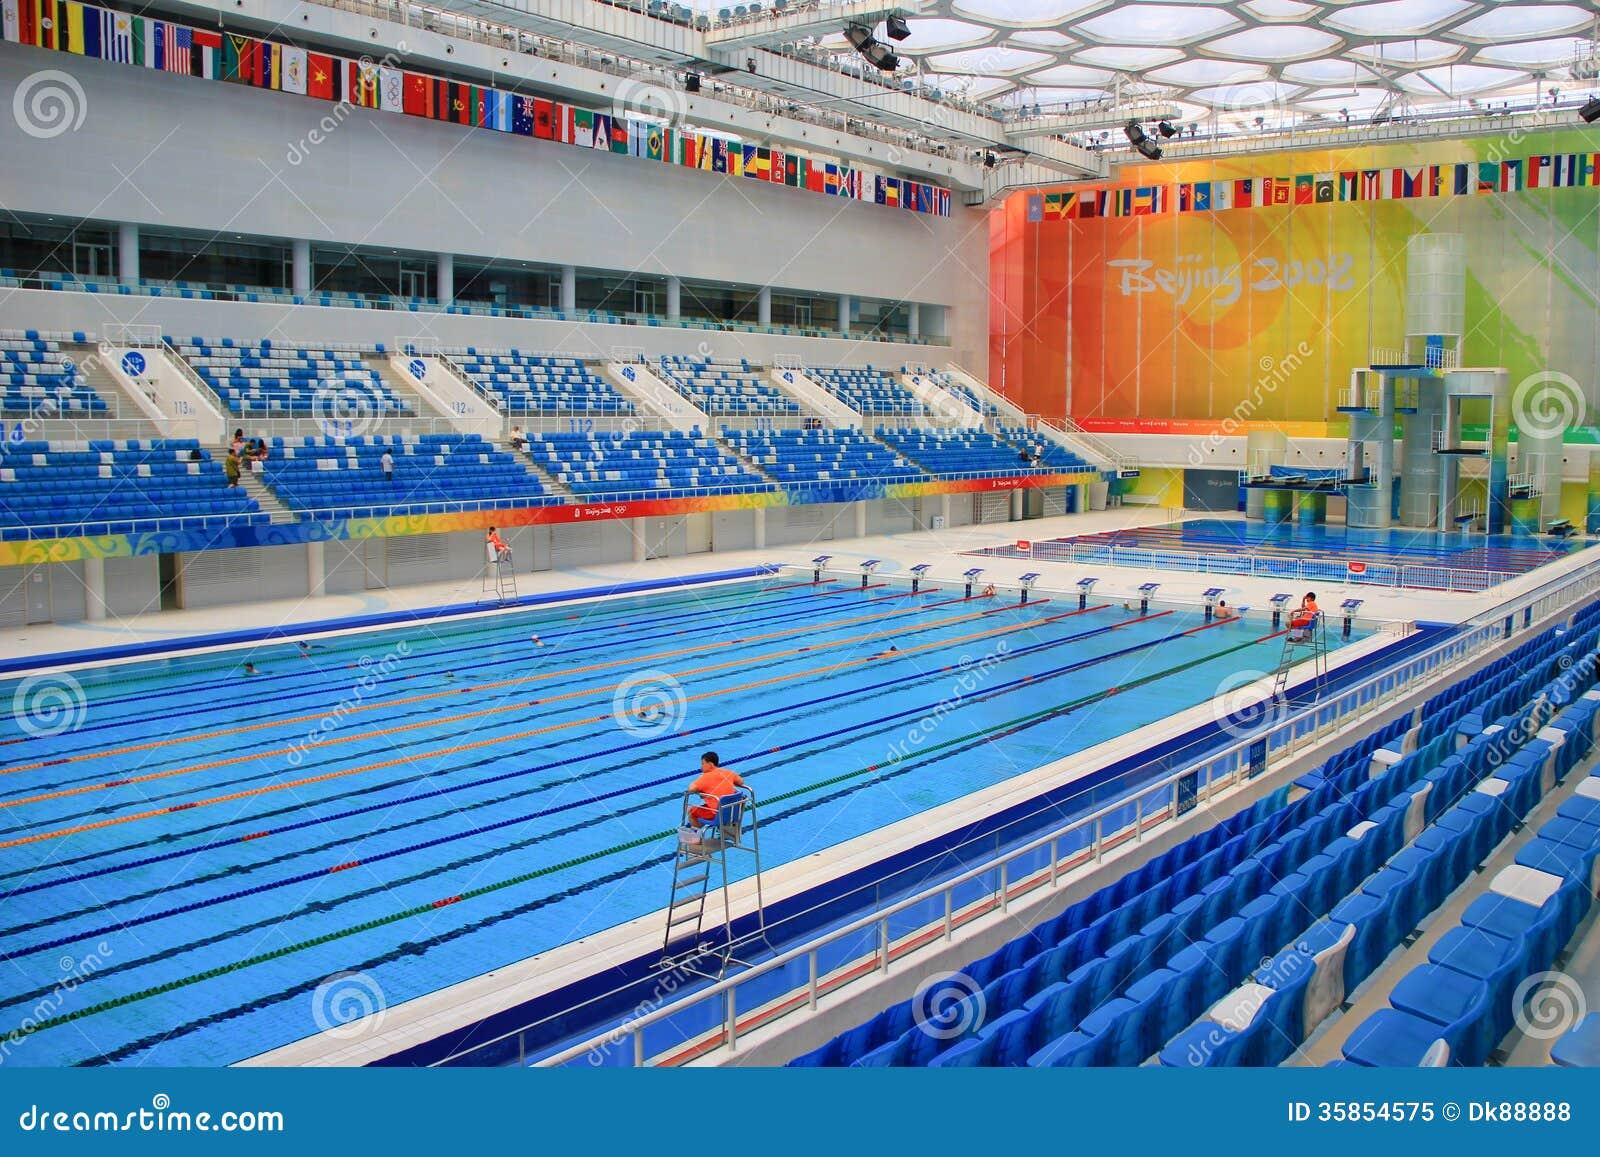 Beijing 2008 Olympic Swimming Pool Editorial Image Image